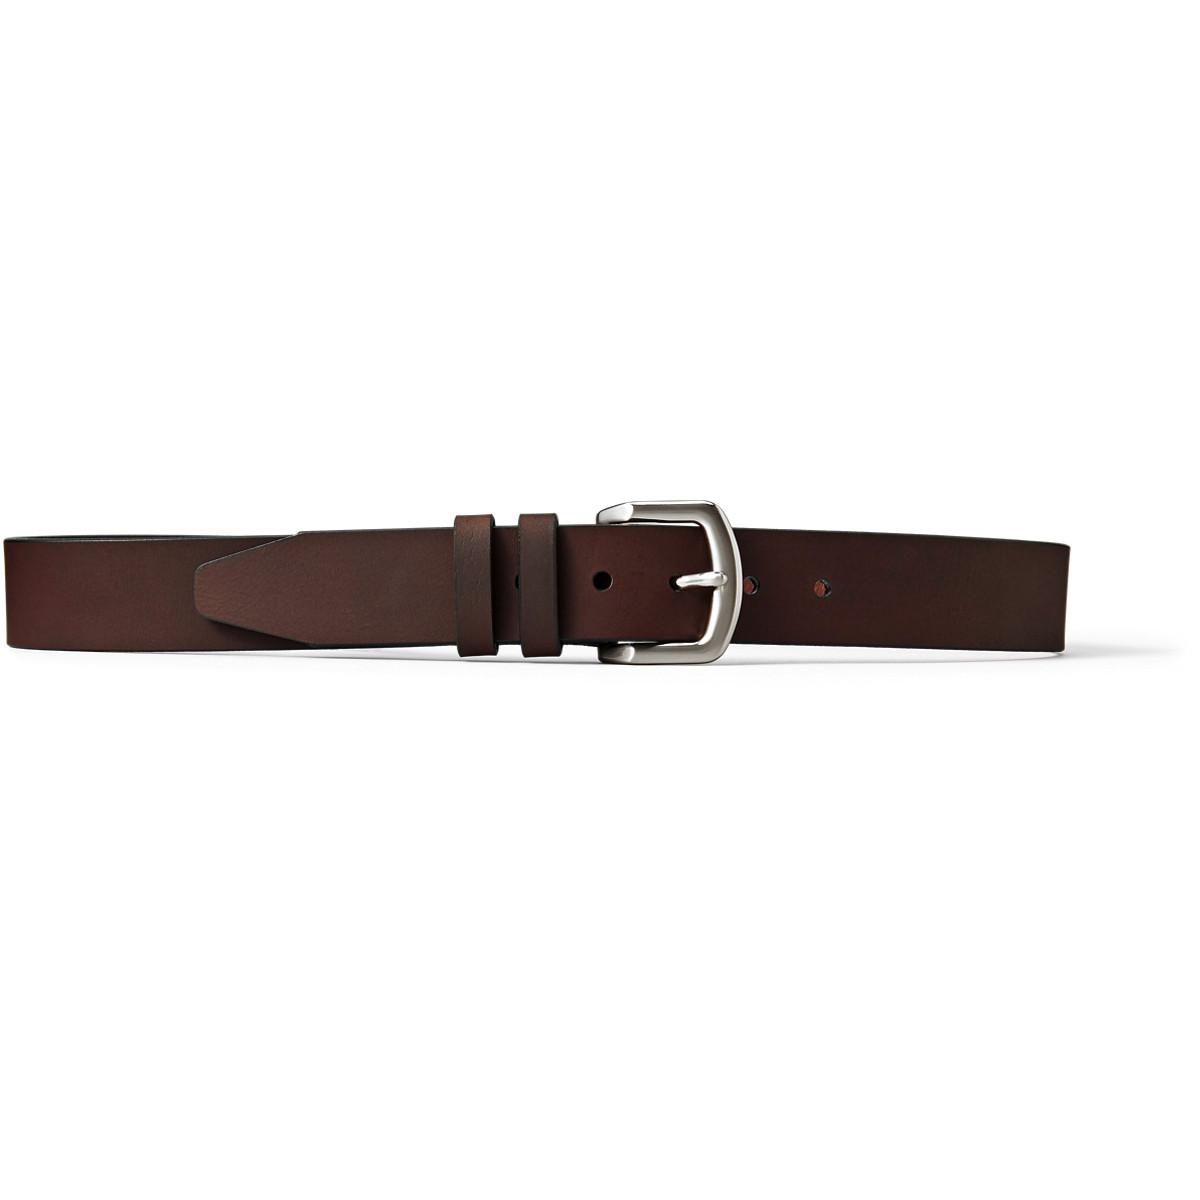 Danner Brushgun Belt - Brown w/ Nickel